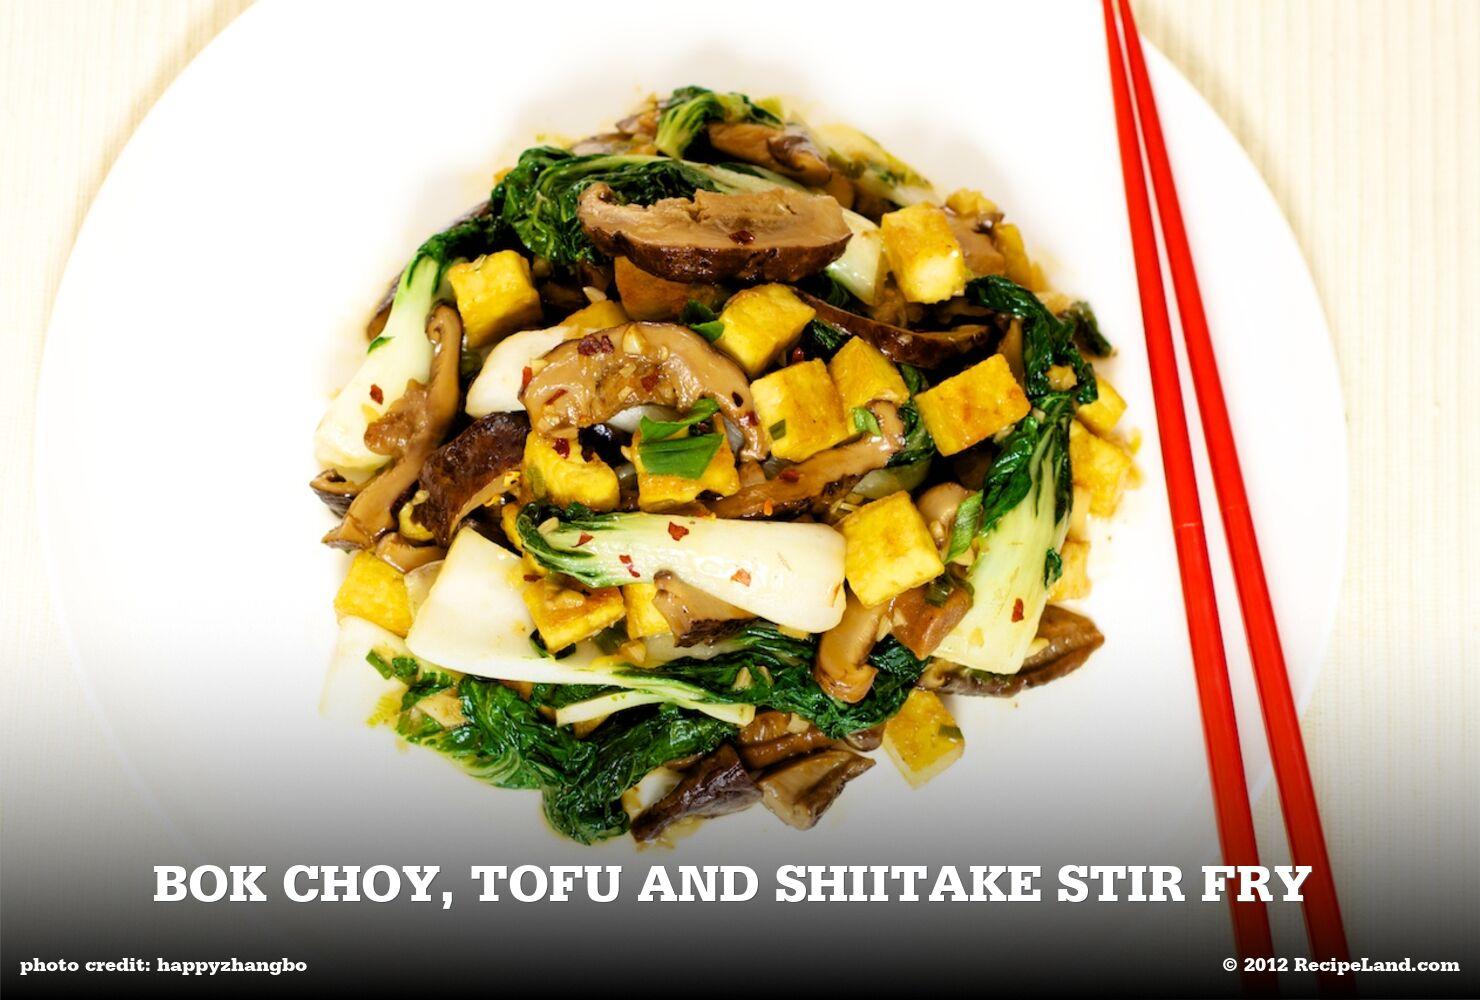 Bok Choy, Tofu and Shiitake Stir Fry